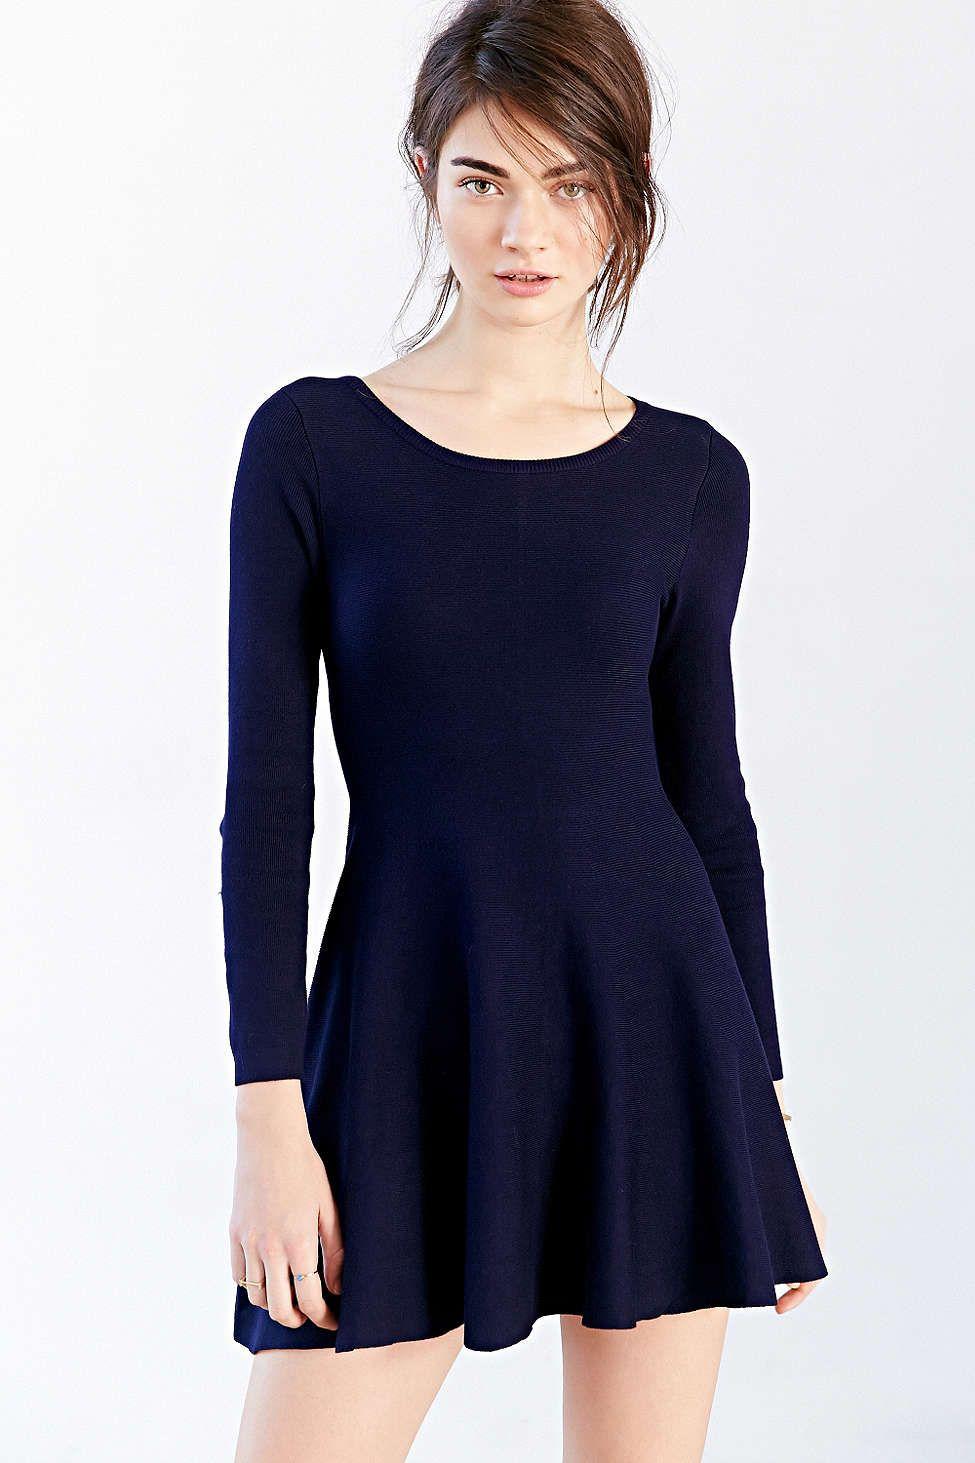 Glamorous Long-Sleeve Sweater Dress